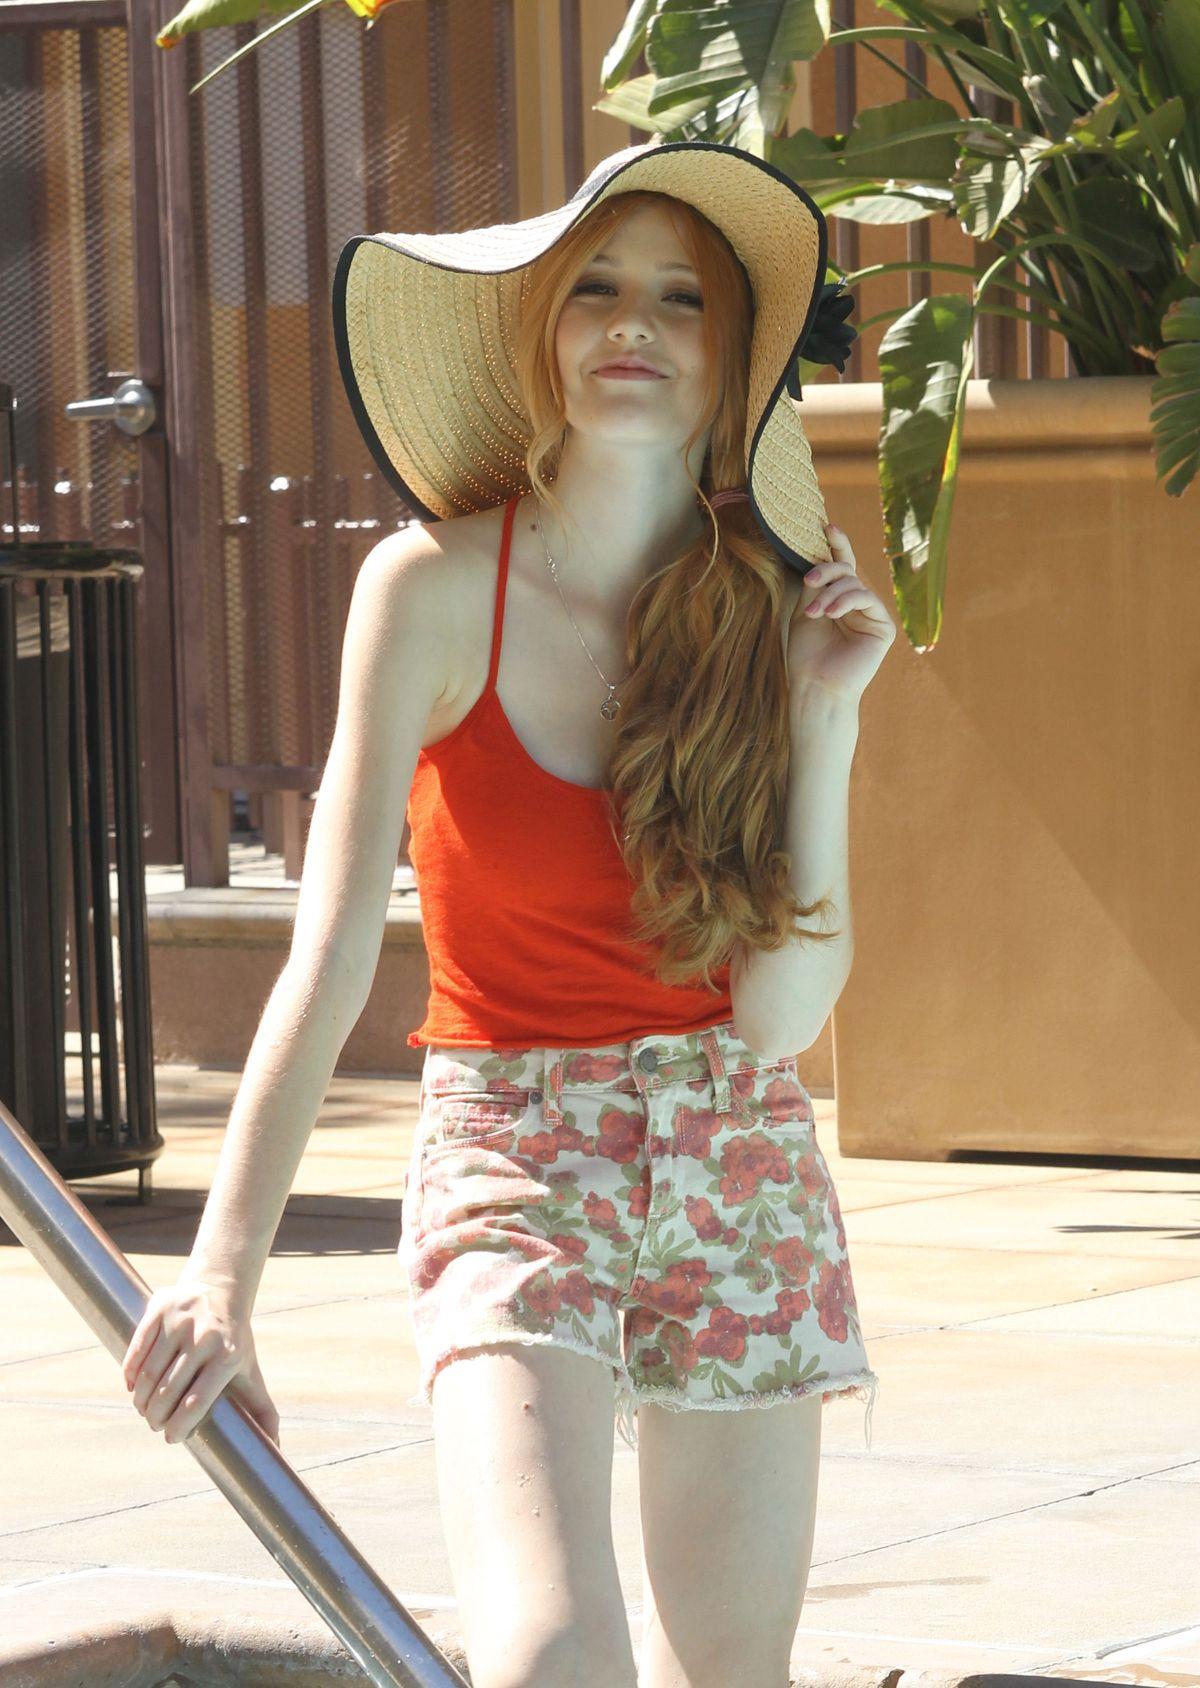 Katherine Mcnamara At Photoshoot By A Pool In Los Angeles